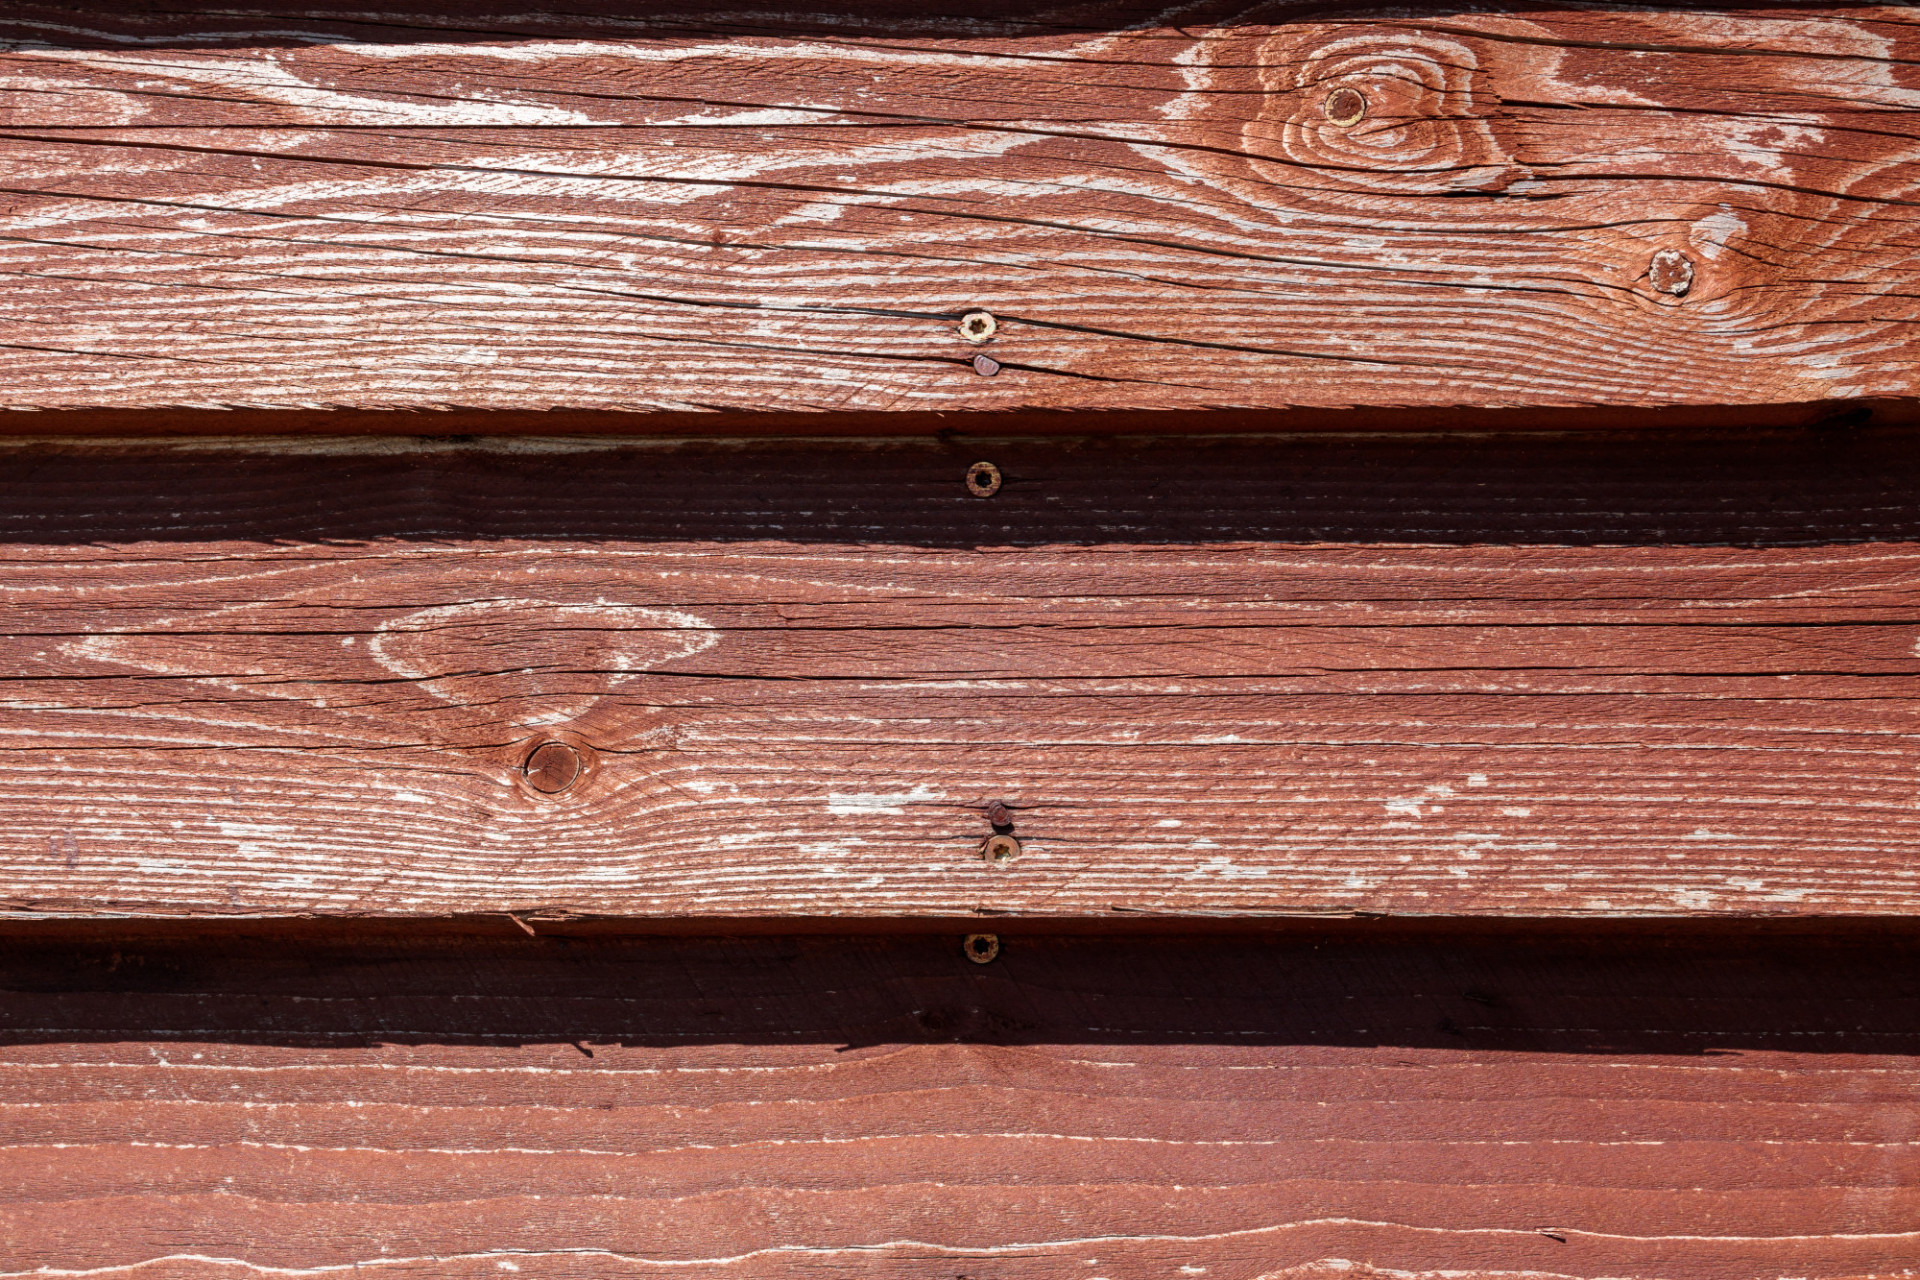 Reddish brown wood texture